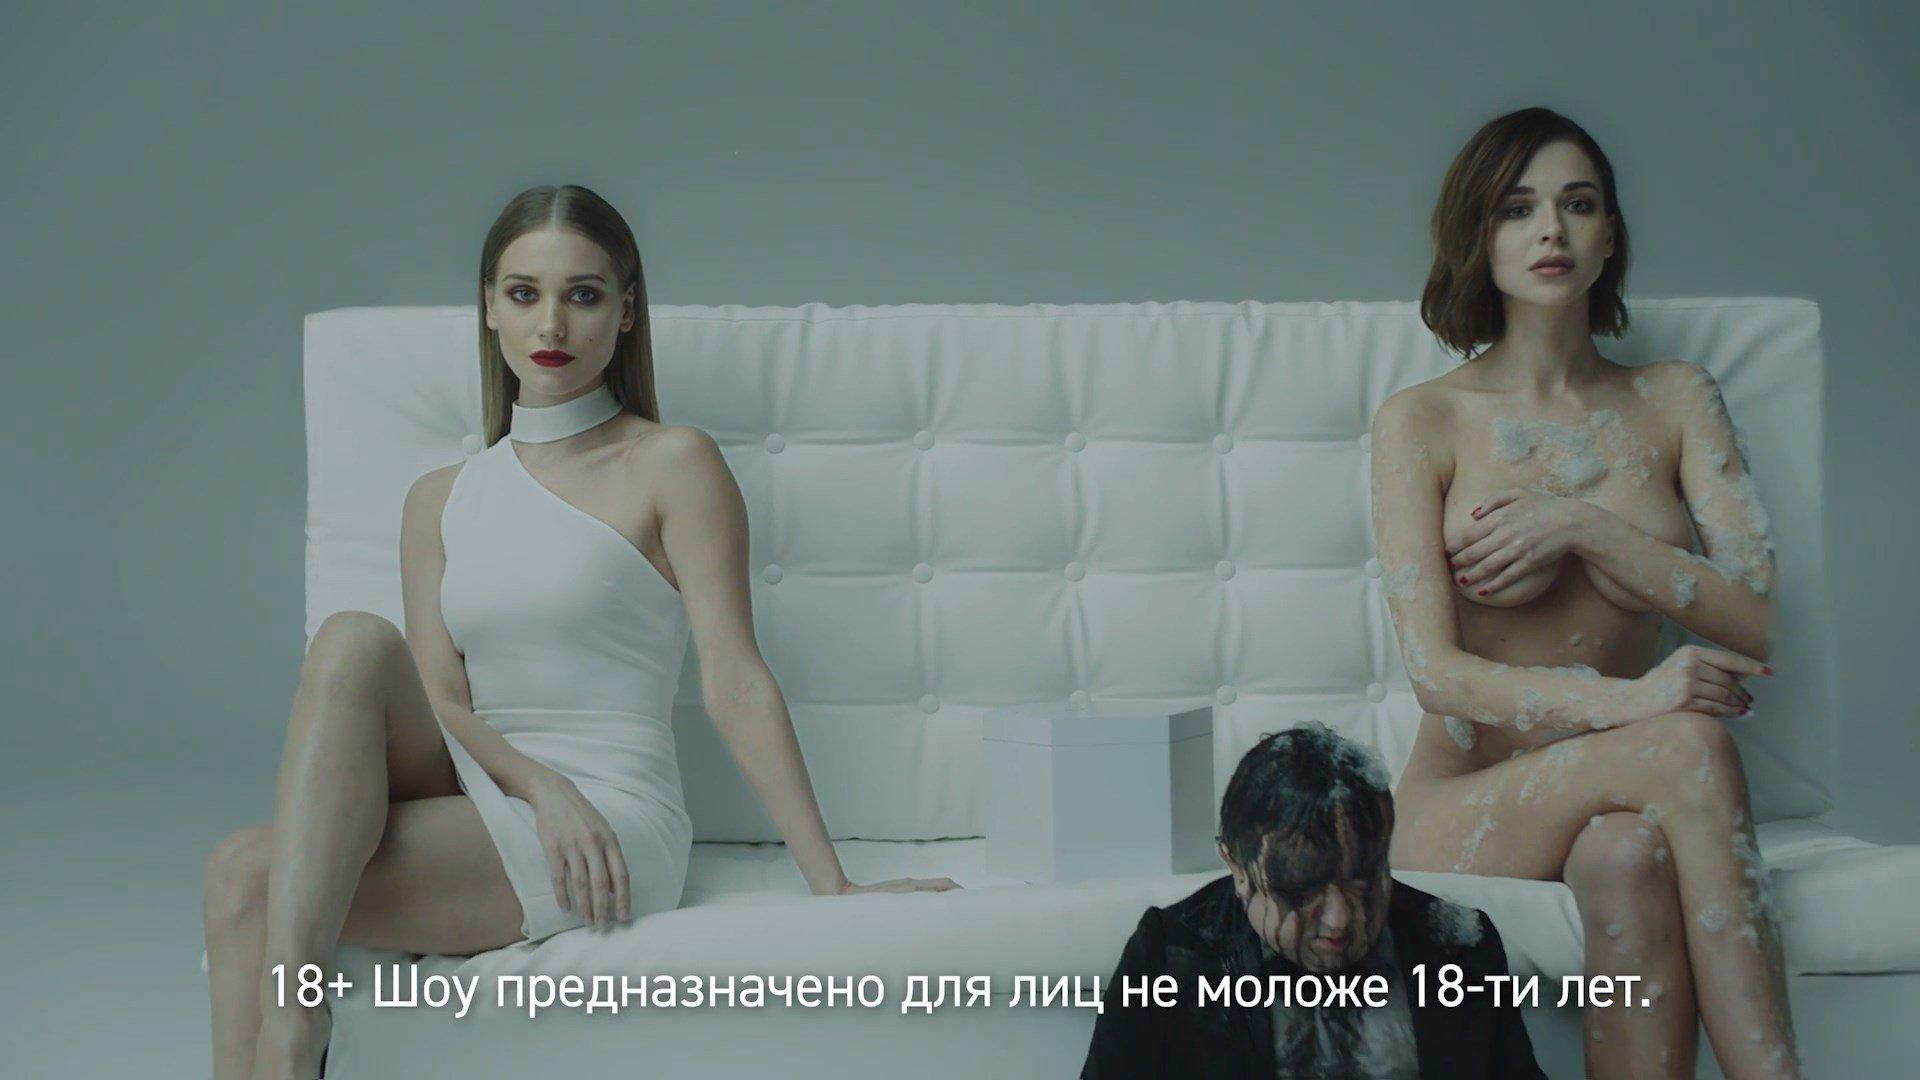 Porno Sofia Sinitsyna nudes (87 photos), Pussy, Cleavage, Boobs, butt 2020